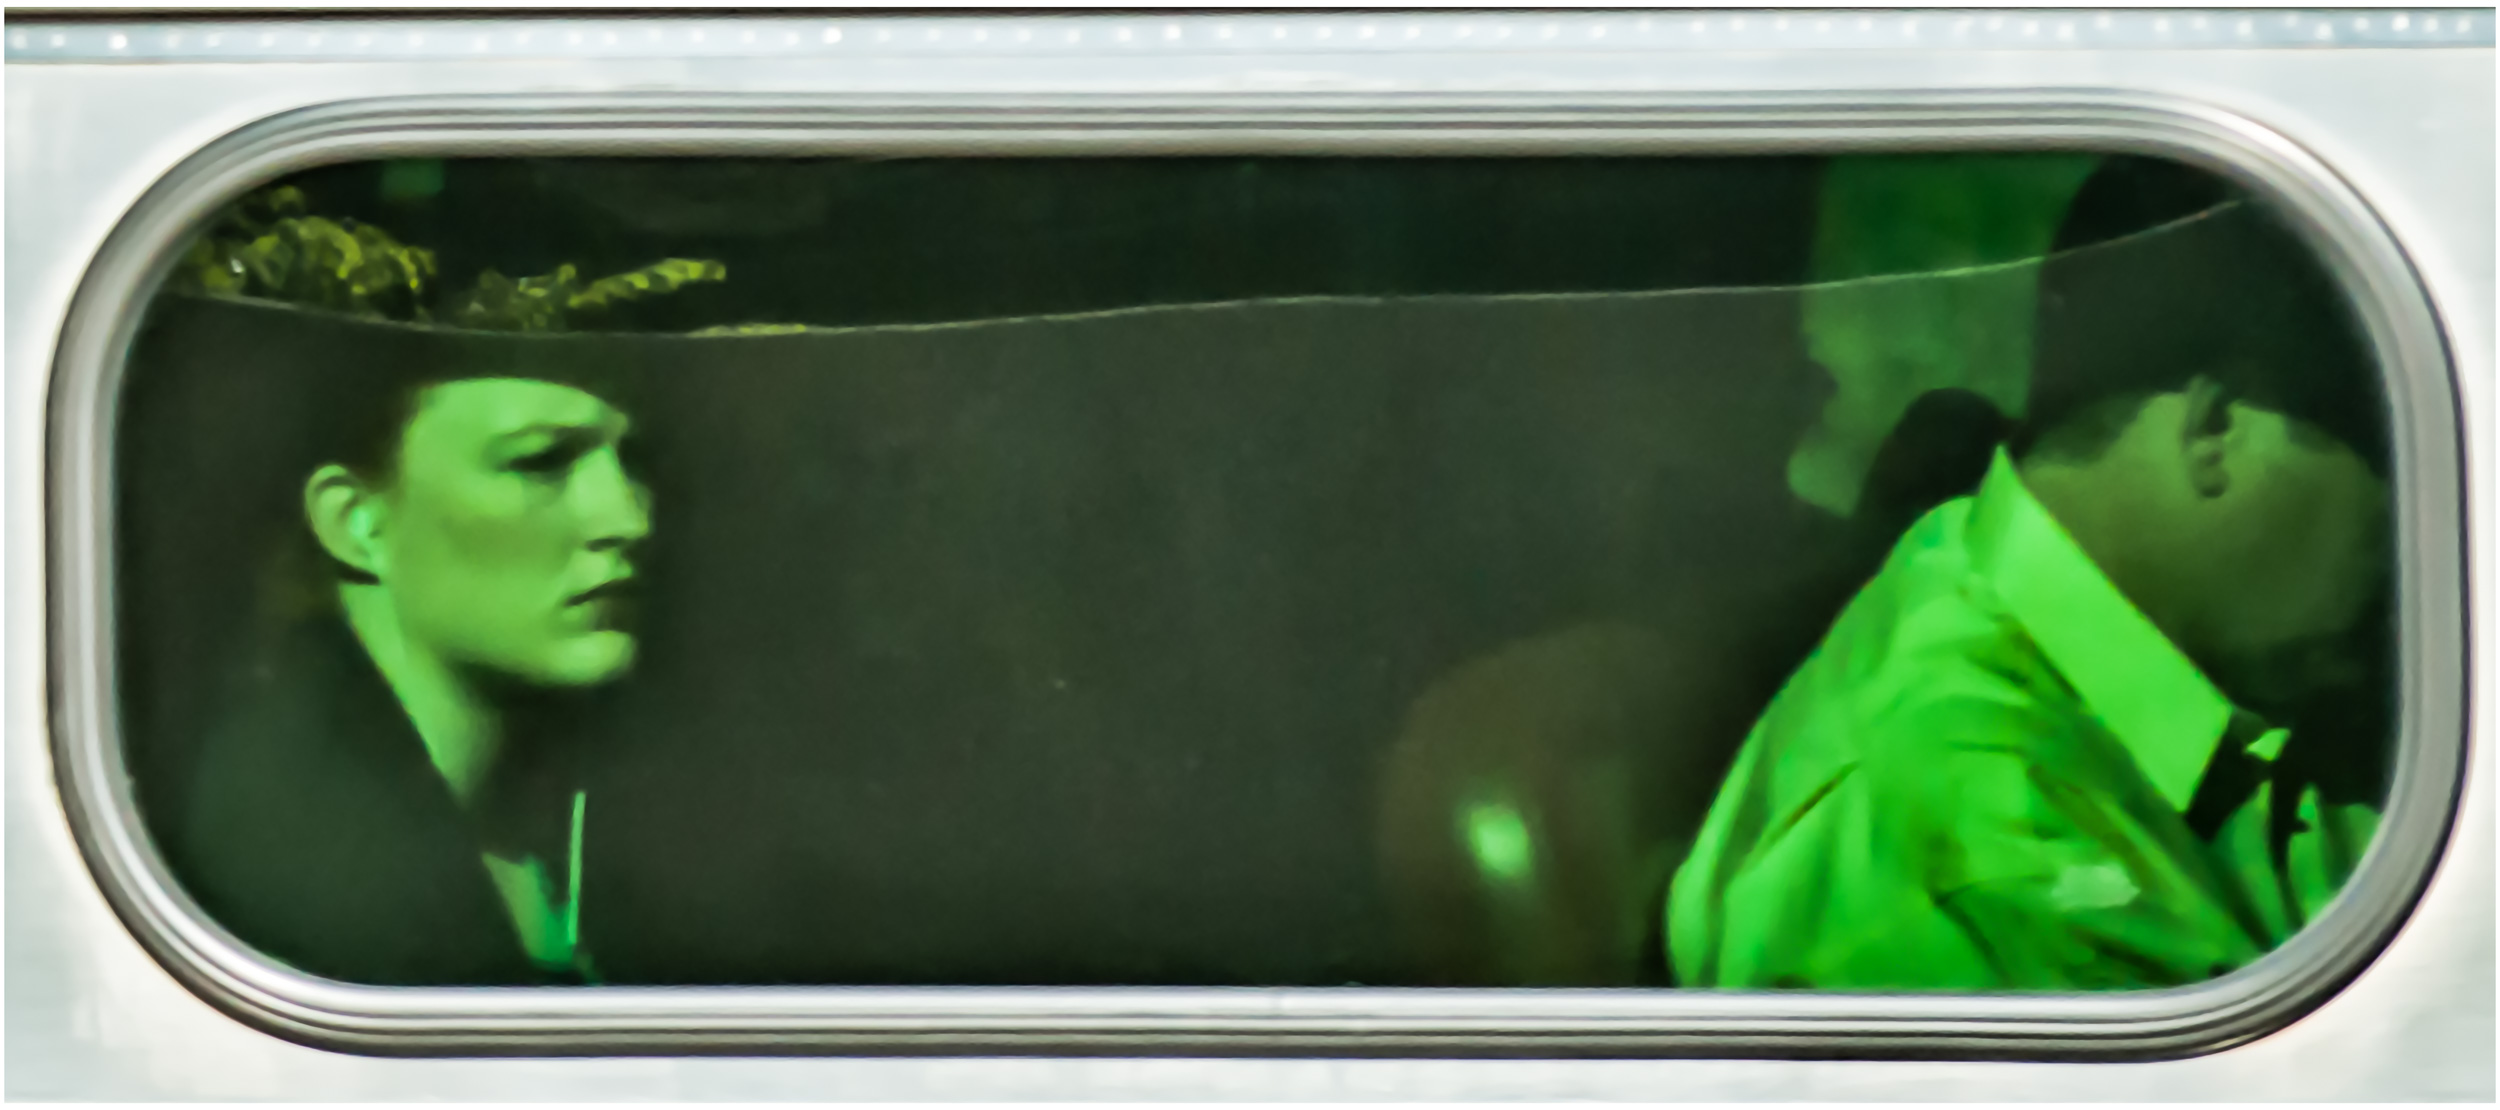 Green #4, 2013